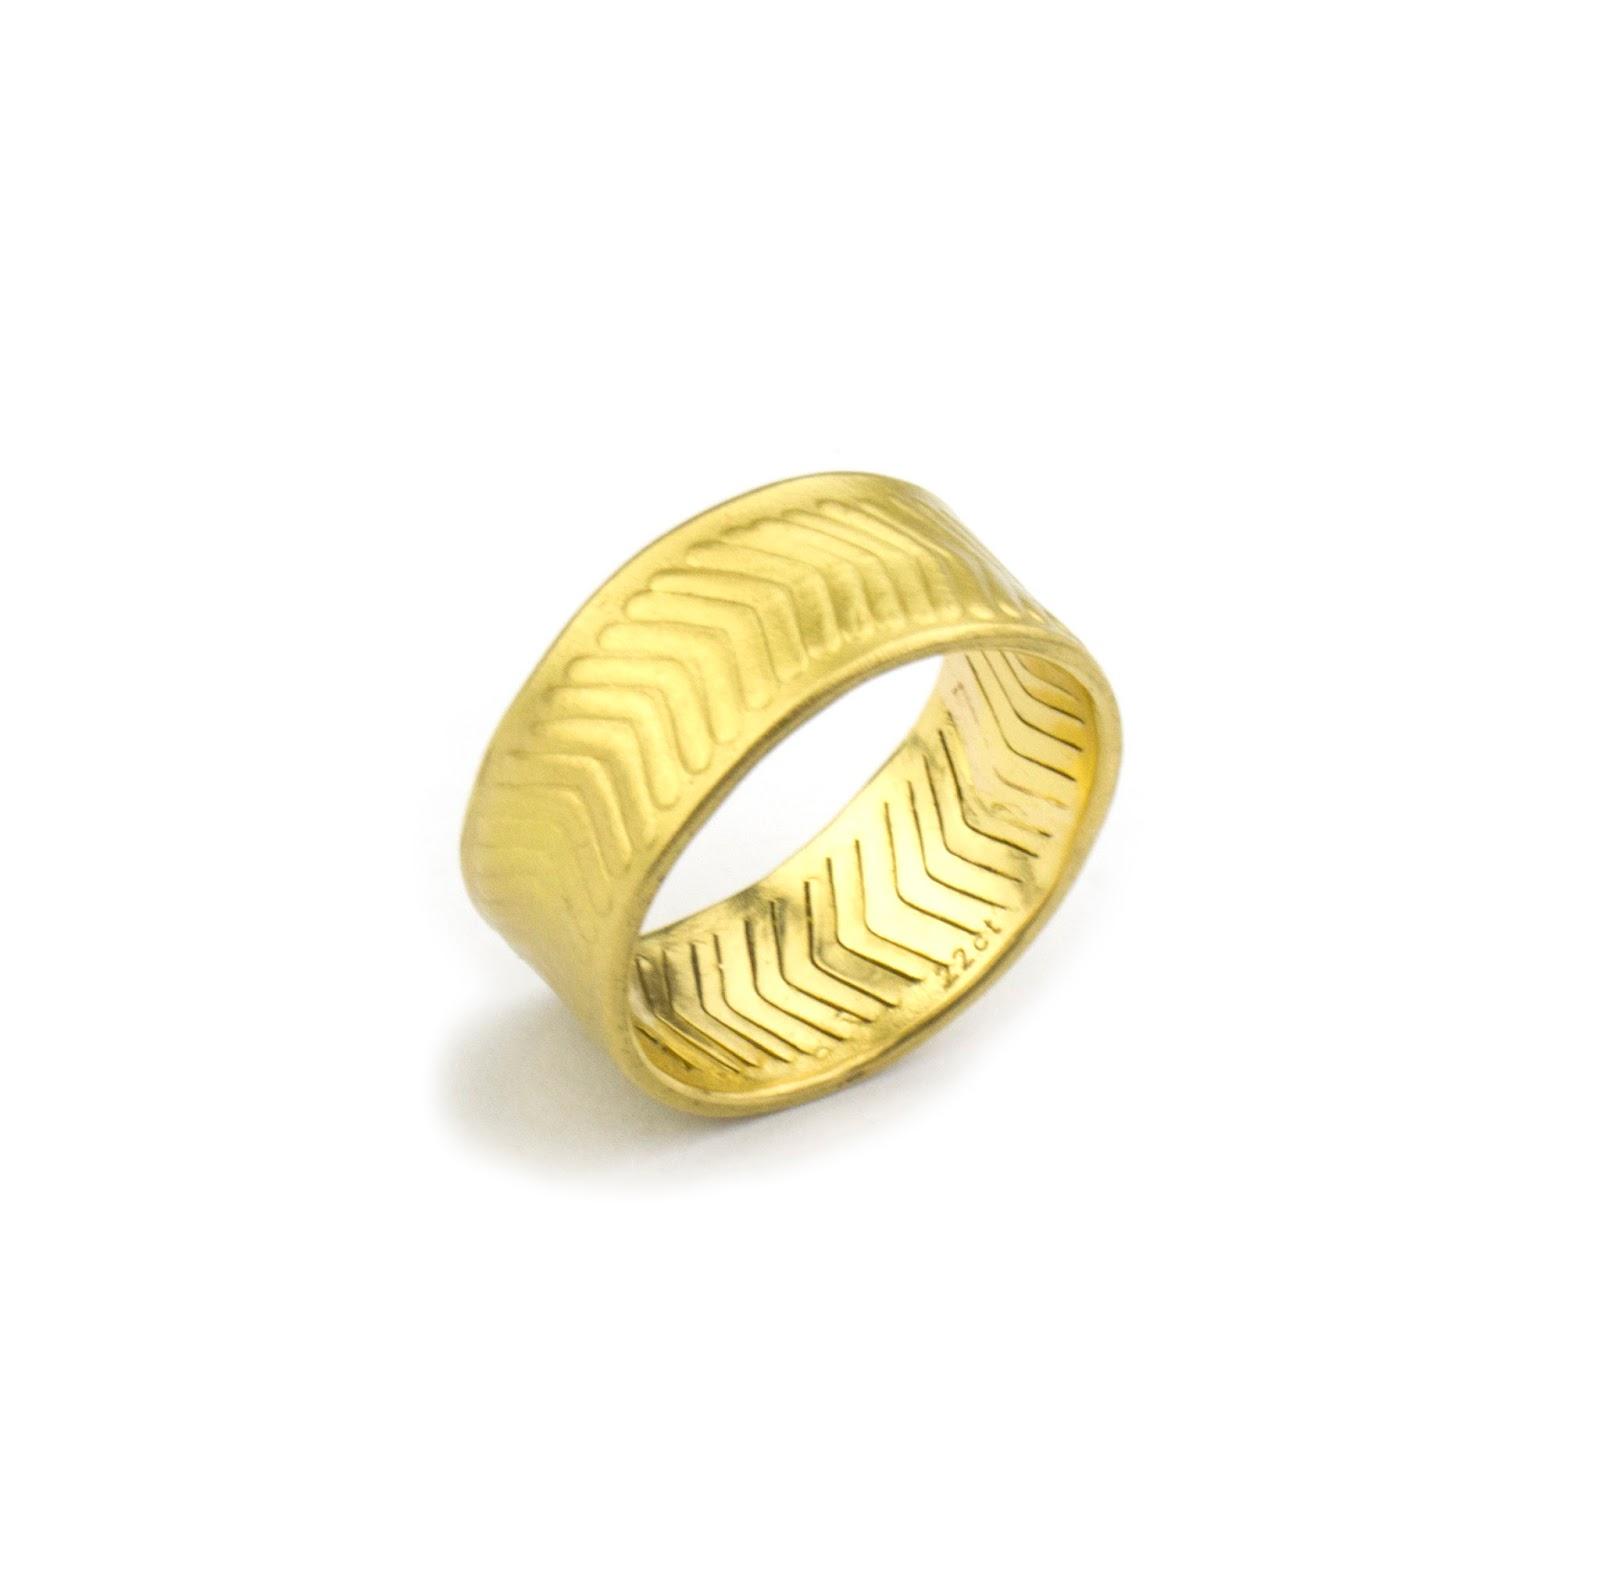 Chevron Mens Ring 22 Carat Gold